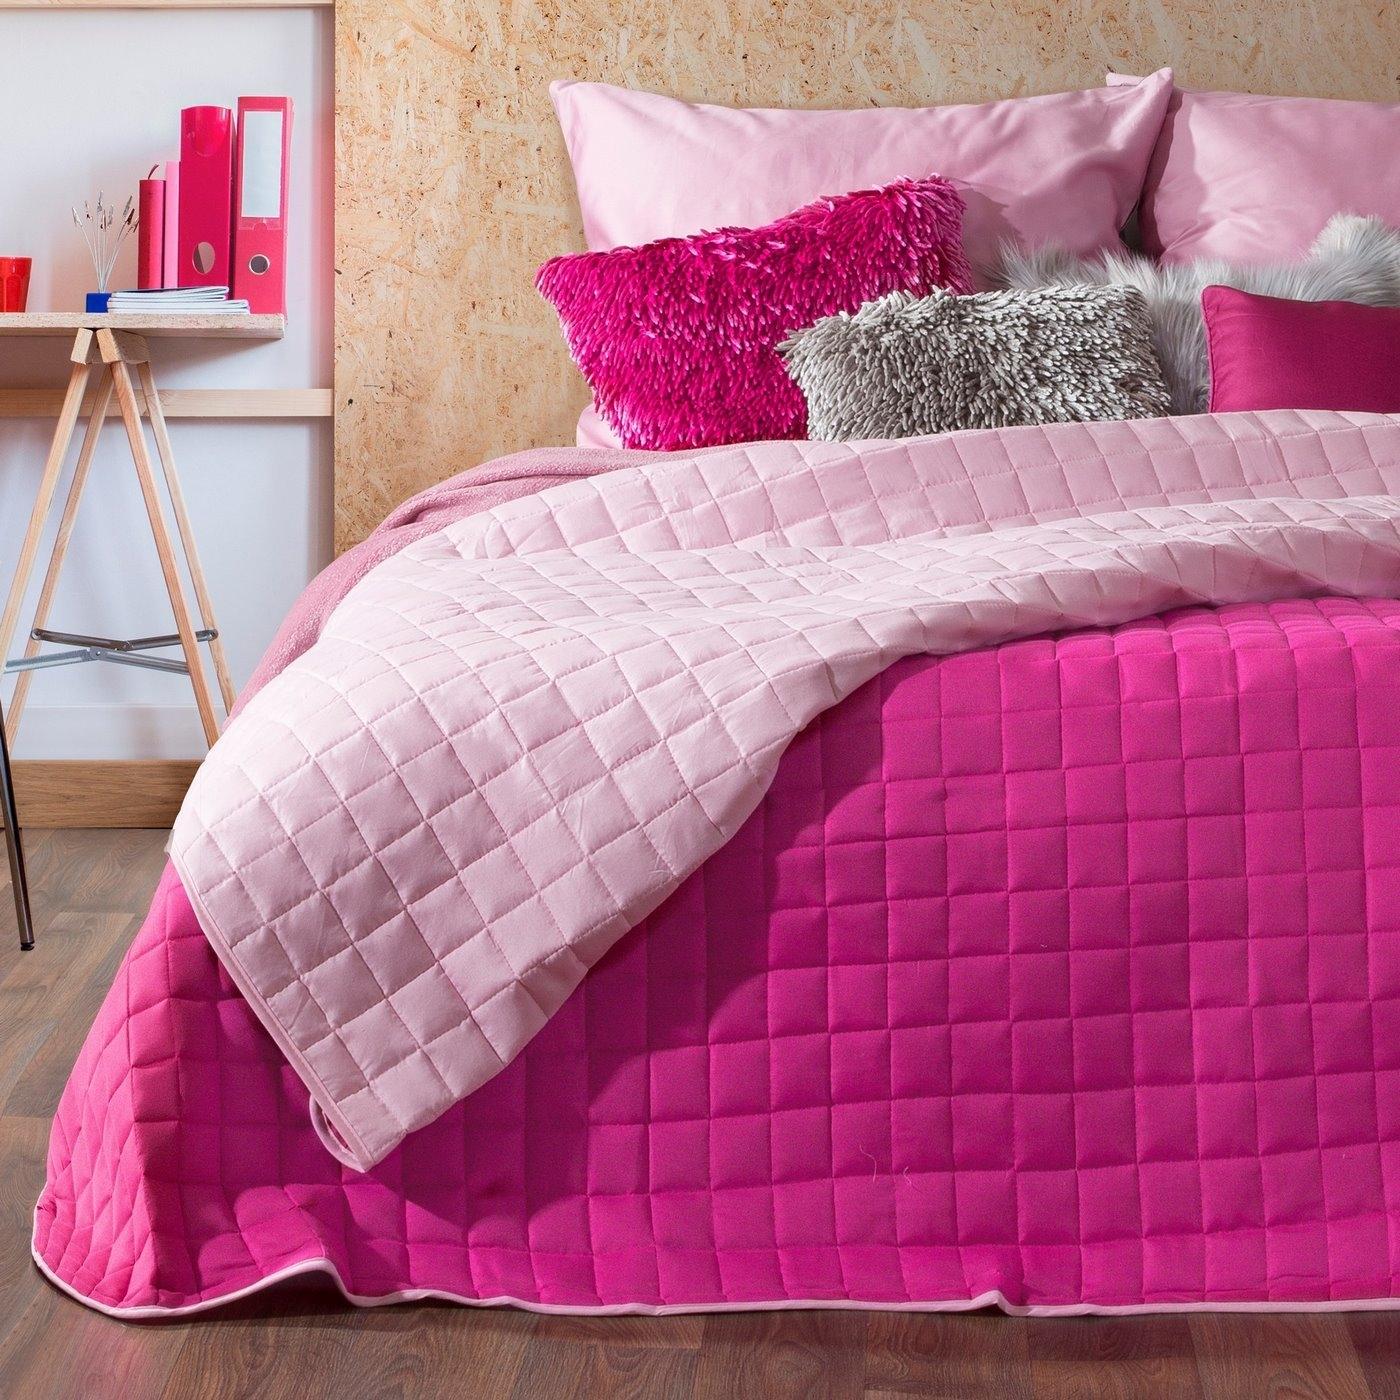 Cuvertura reversibila Paula Fuchsia / Light Pink, 220 x 240 cm